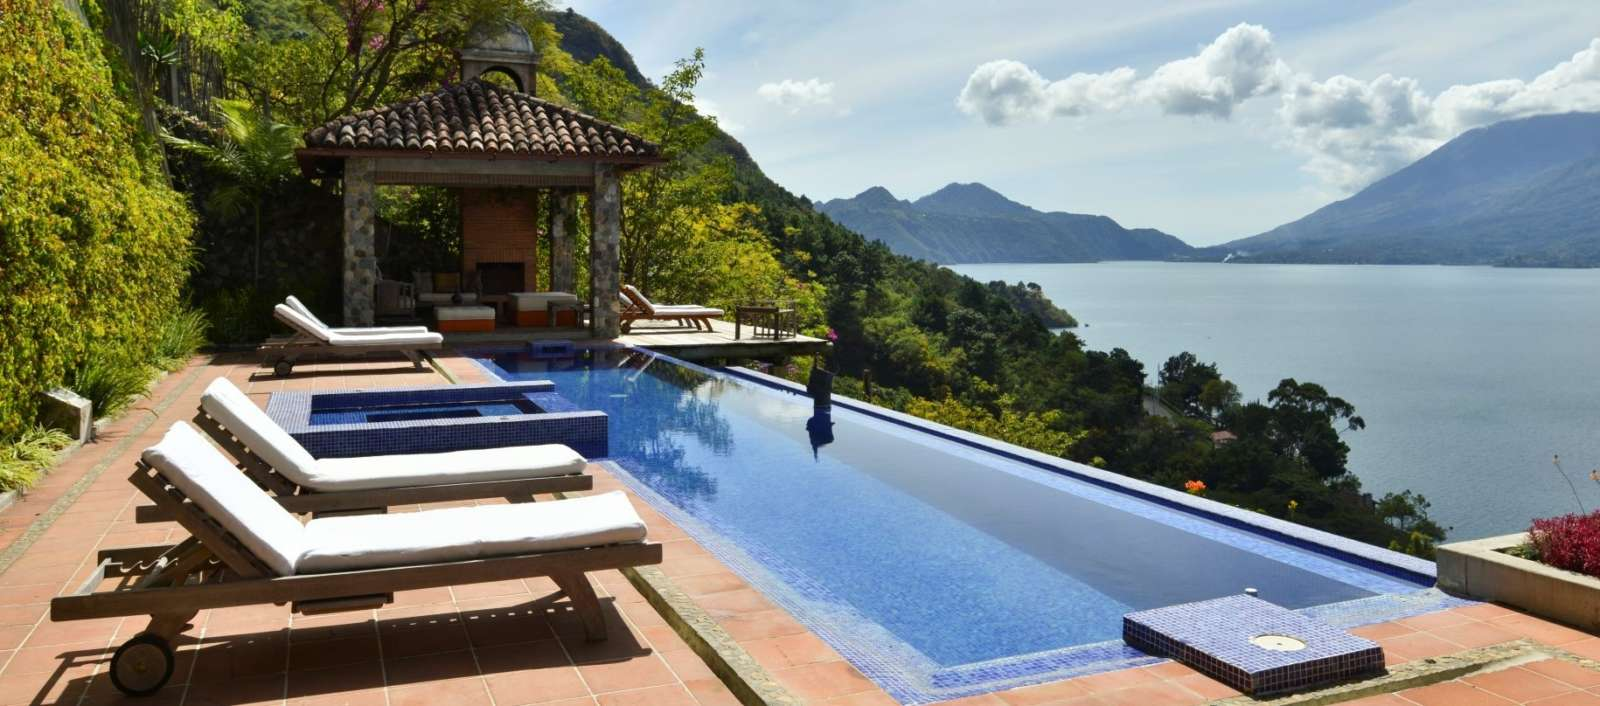 Beyond The Ordinary accommodation in Cuba, Guatemala, Yucatan Peninsula, Mexico